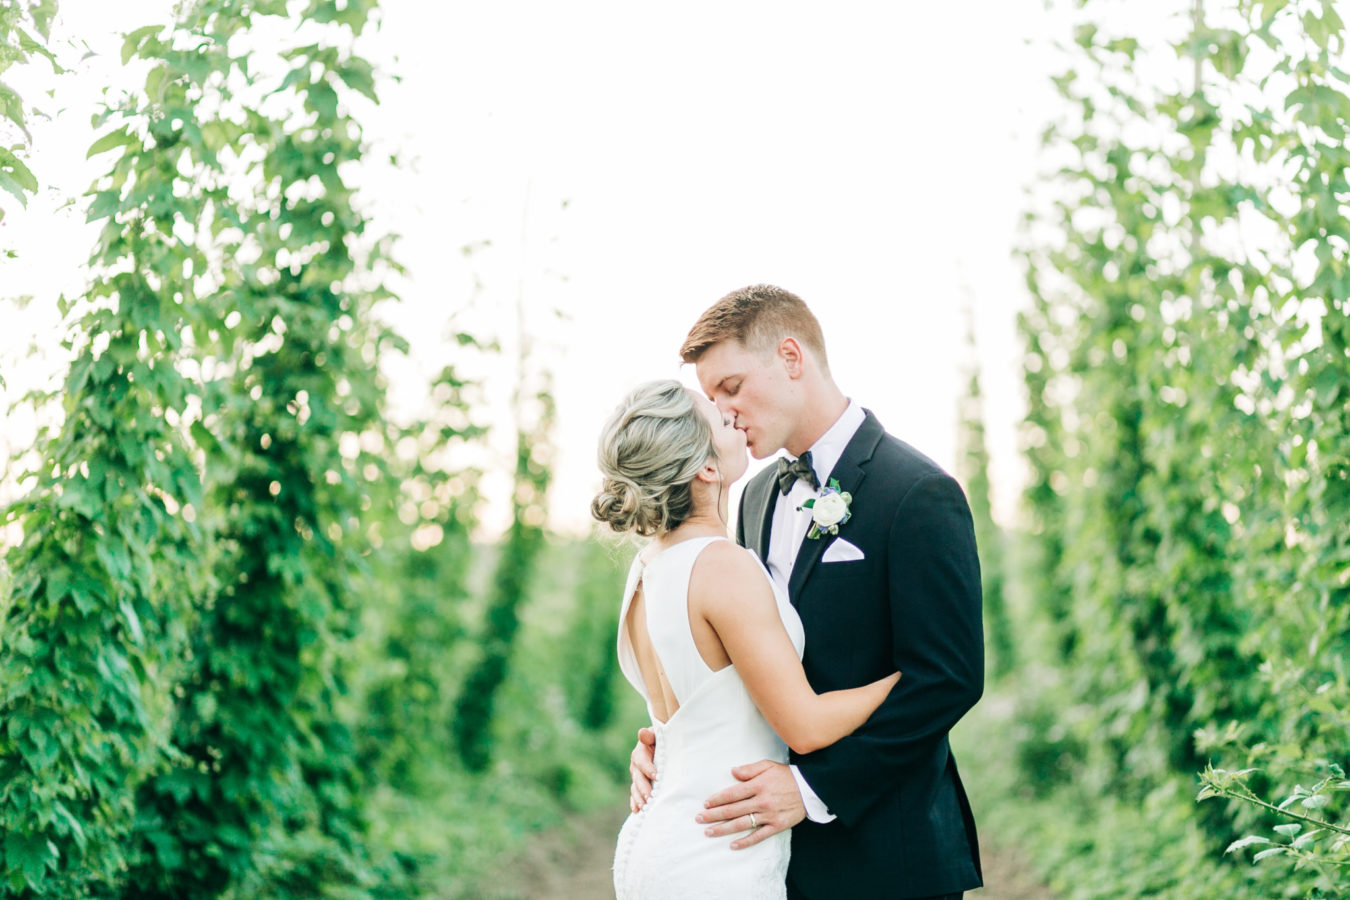 Couples Portrait Tips, Fine Art Wedding Photographer Portland, Oregon